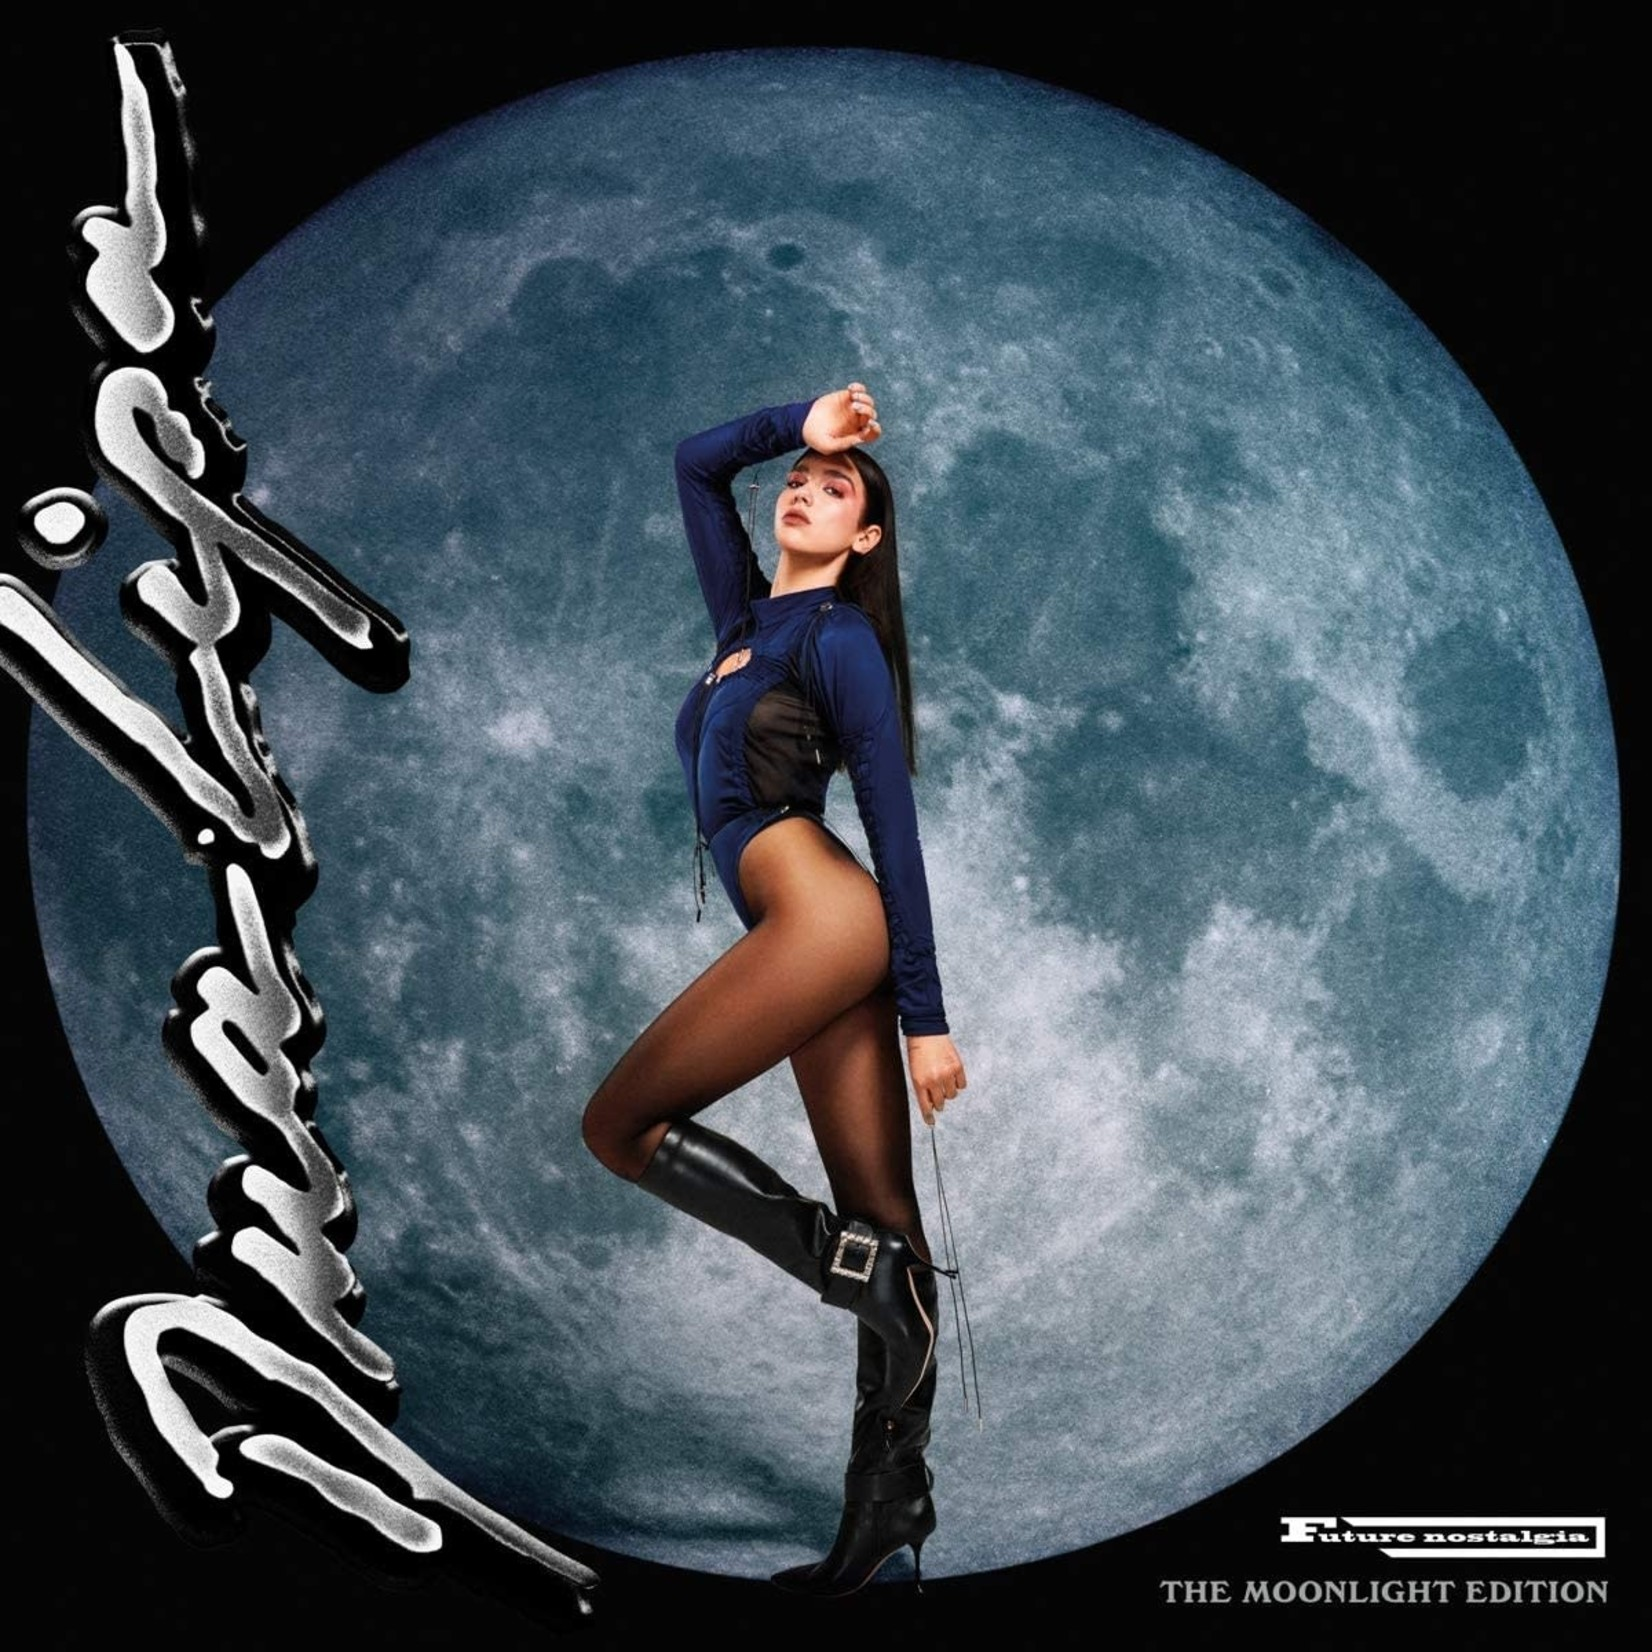 [New] Lipa, Dua: Future Nostalgia (The Moonlight Edition) (2LP)